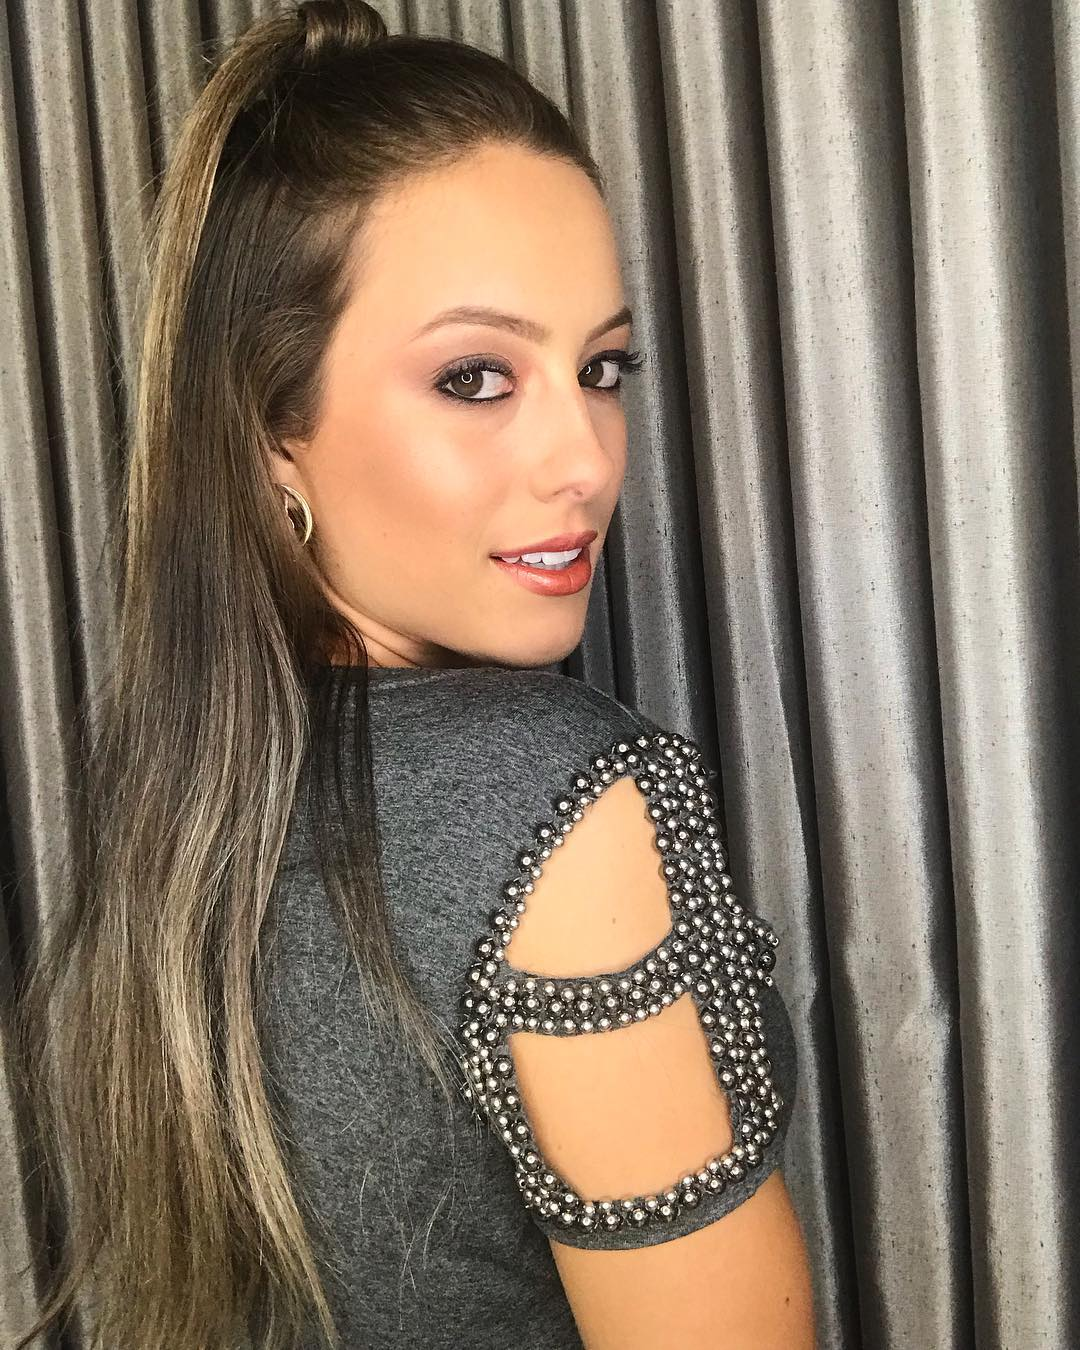 cristine boff sartor, segunda finalista de miss latinoamerica 2019. - Página 2 28753110